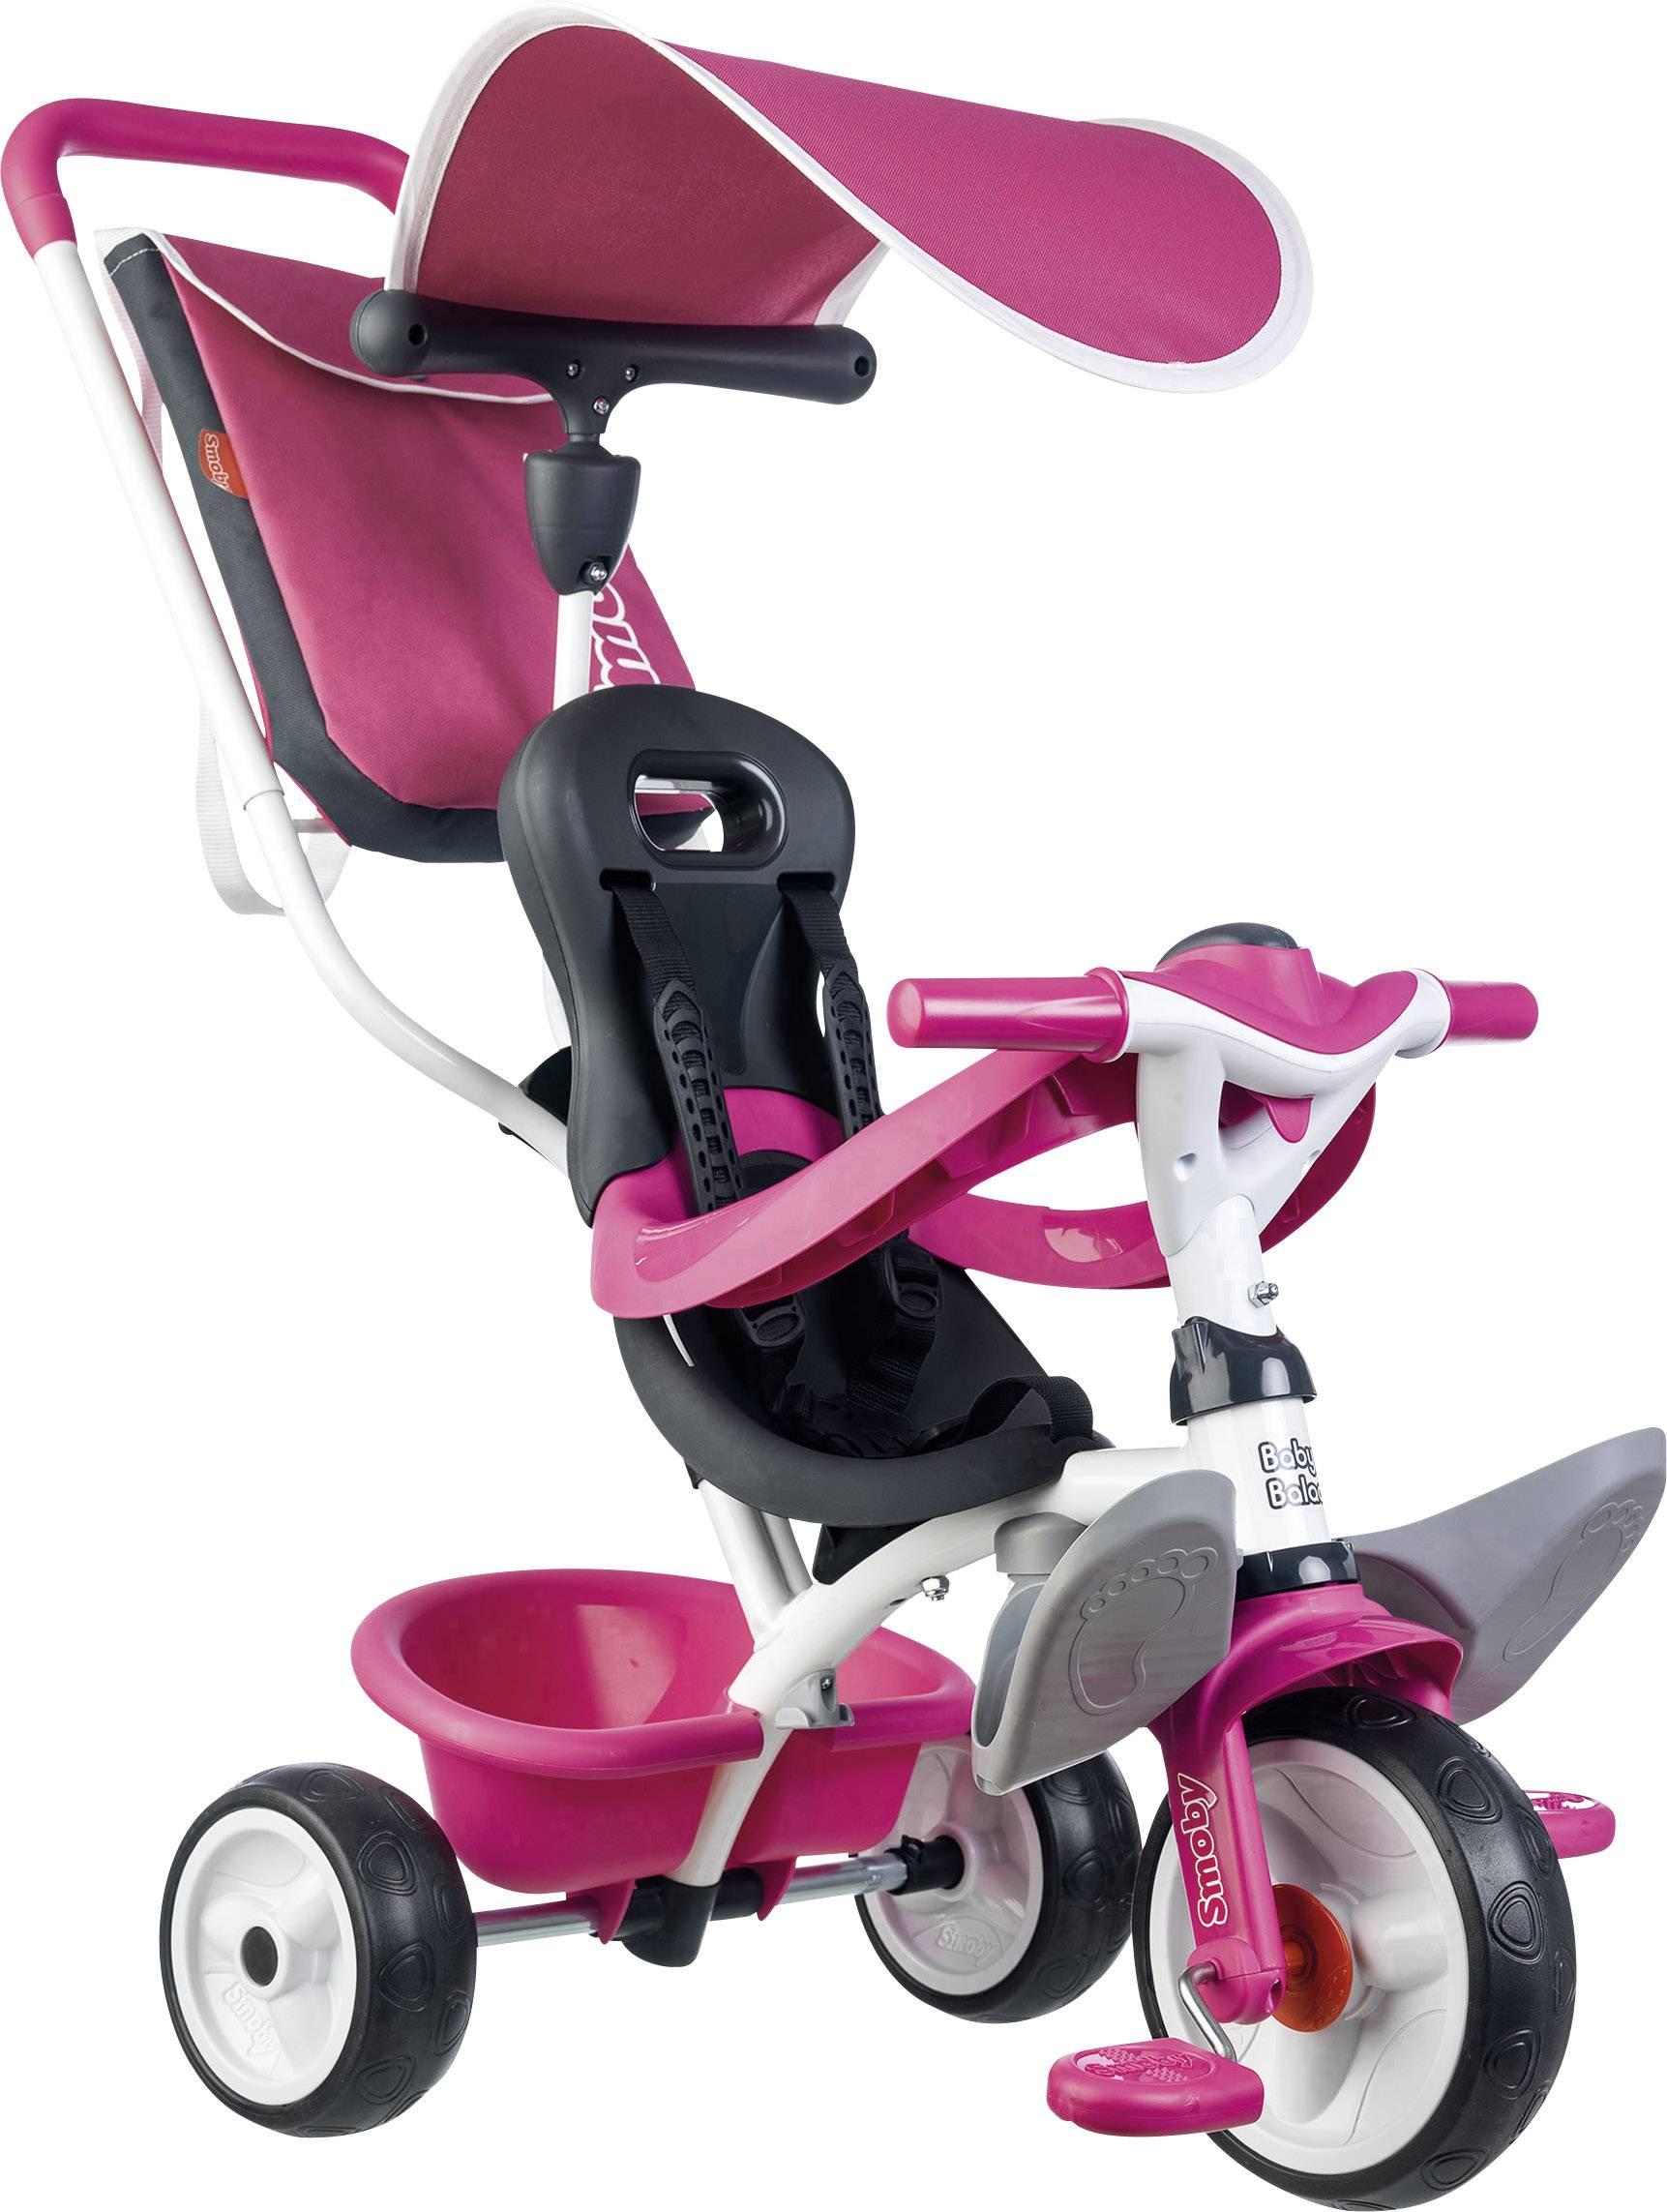 Smoby Triciclo Rosa Baby Balade